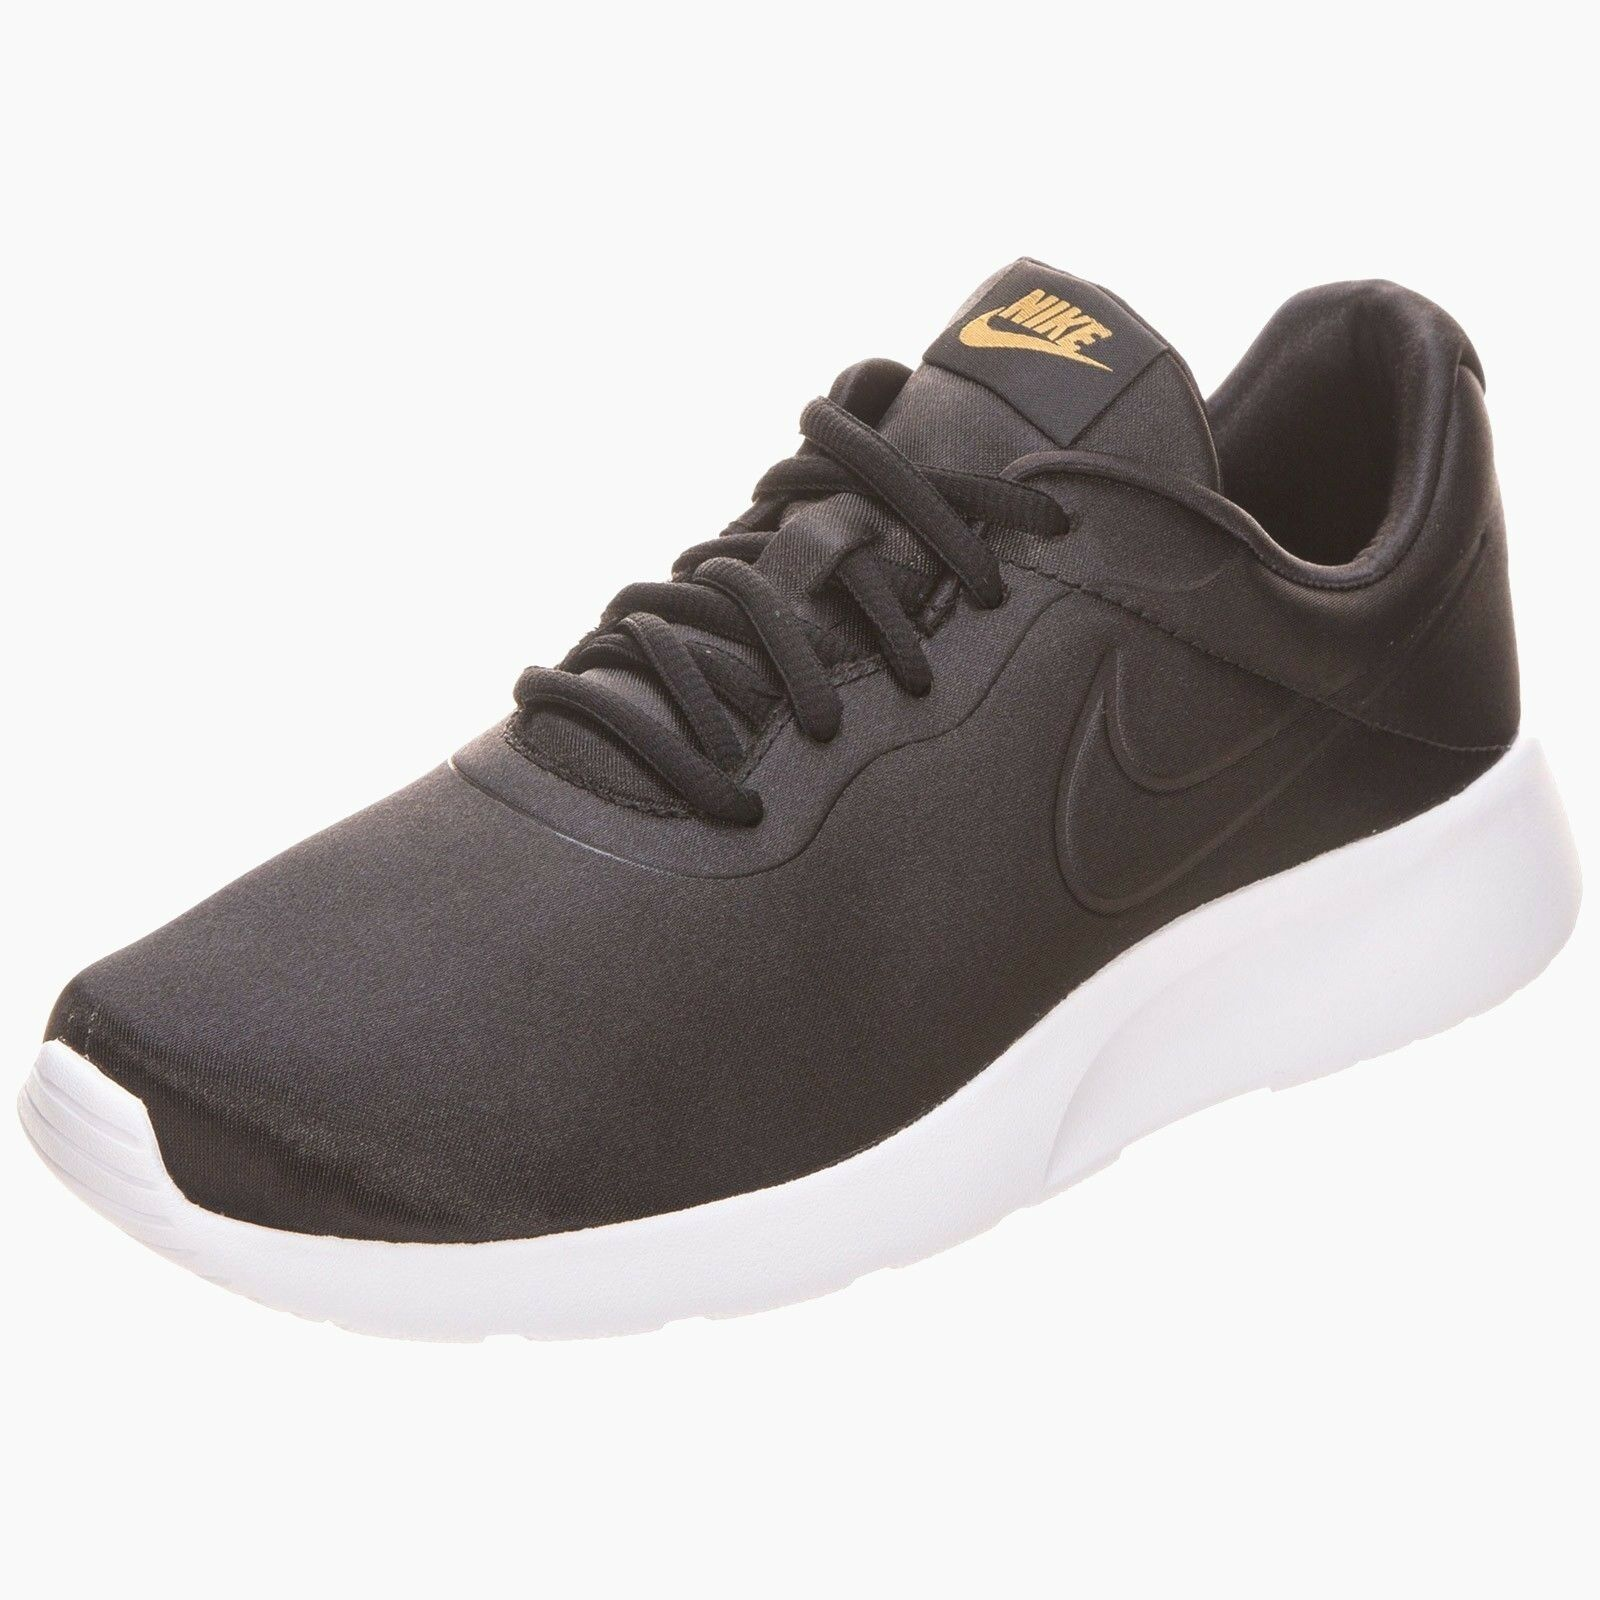 Schuhe Nike Tanjun WMNS Damenschuhe Premium 917537-003 Nero bianco bianco bianco Rasato Nuovo Corsa bb0df3